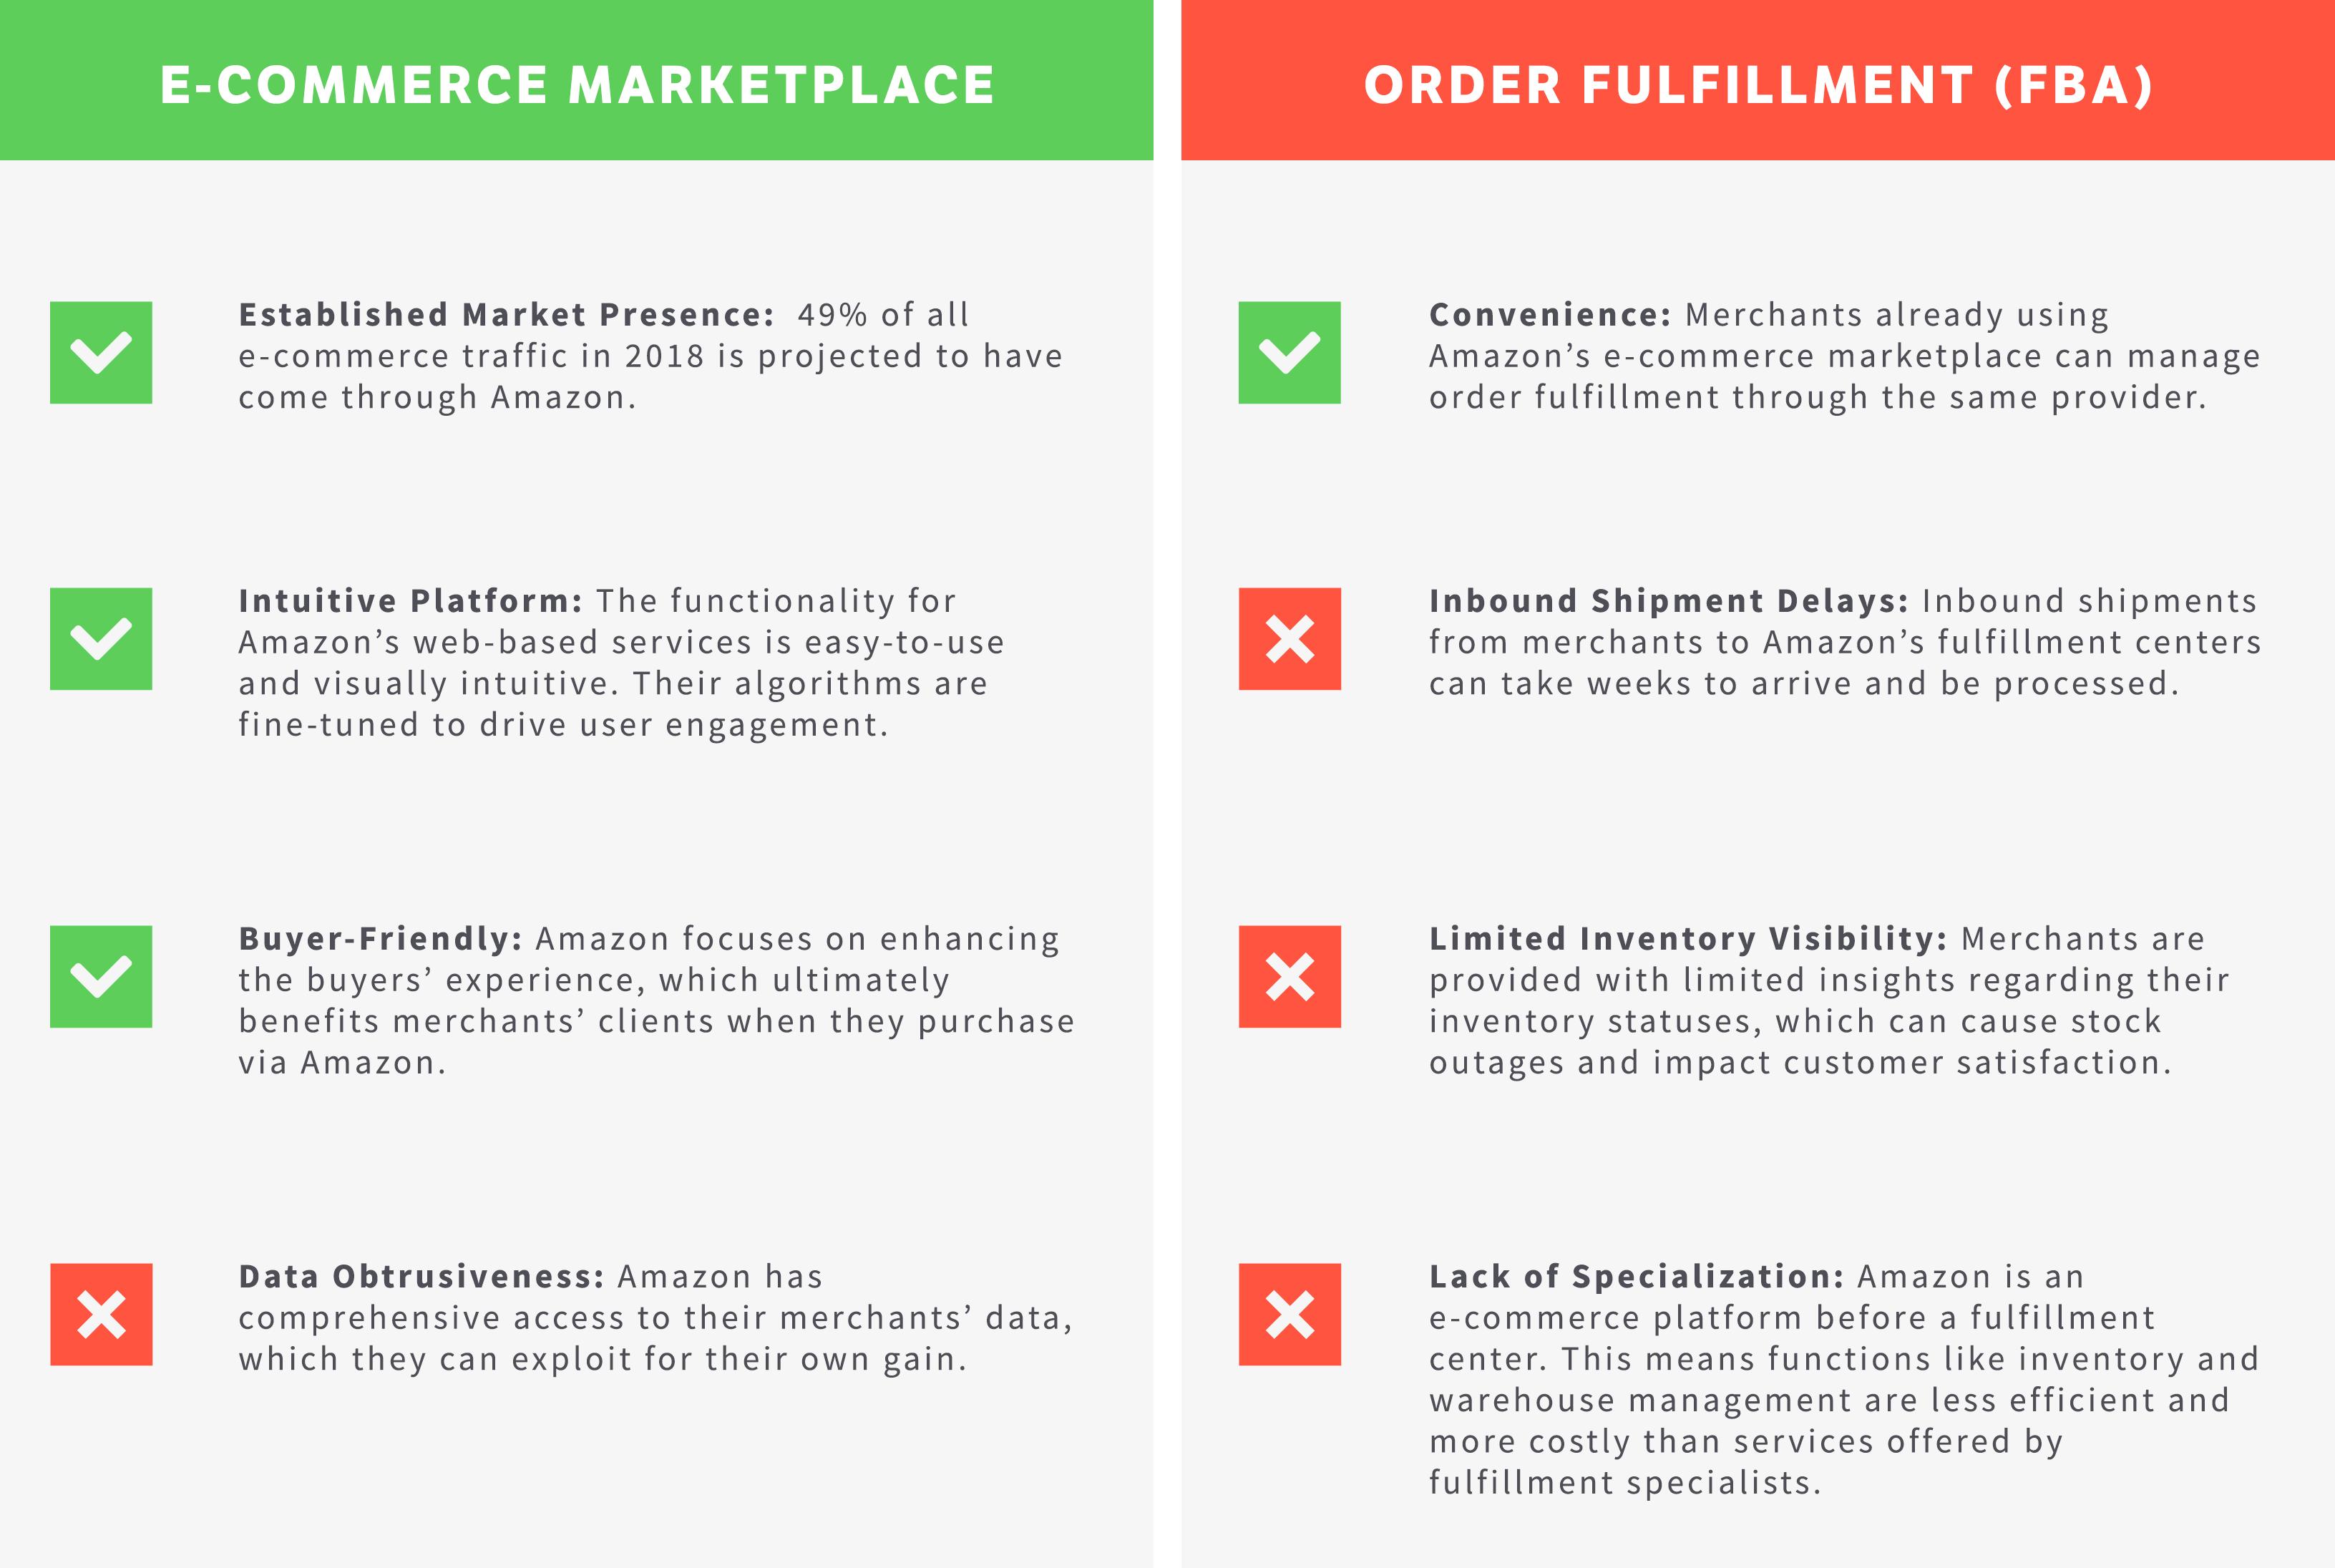 Blog – Warehousing & Fulfillment Takeaways from Amazon